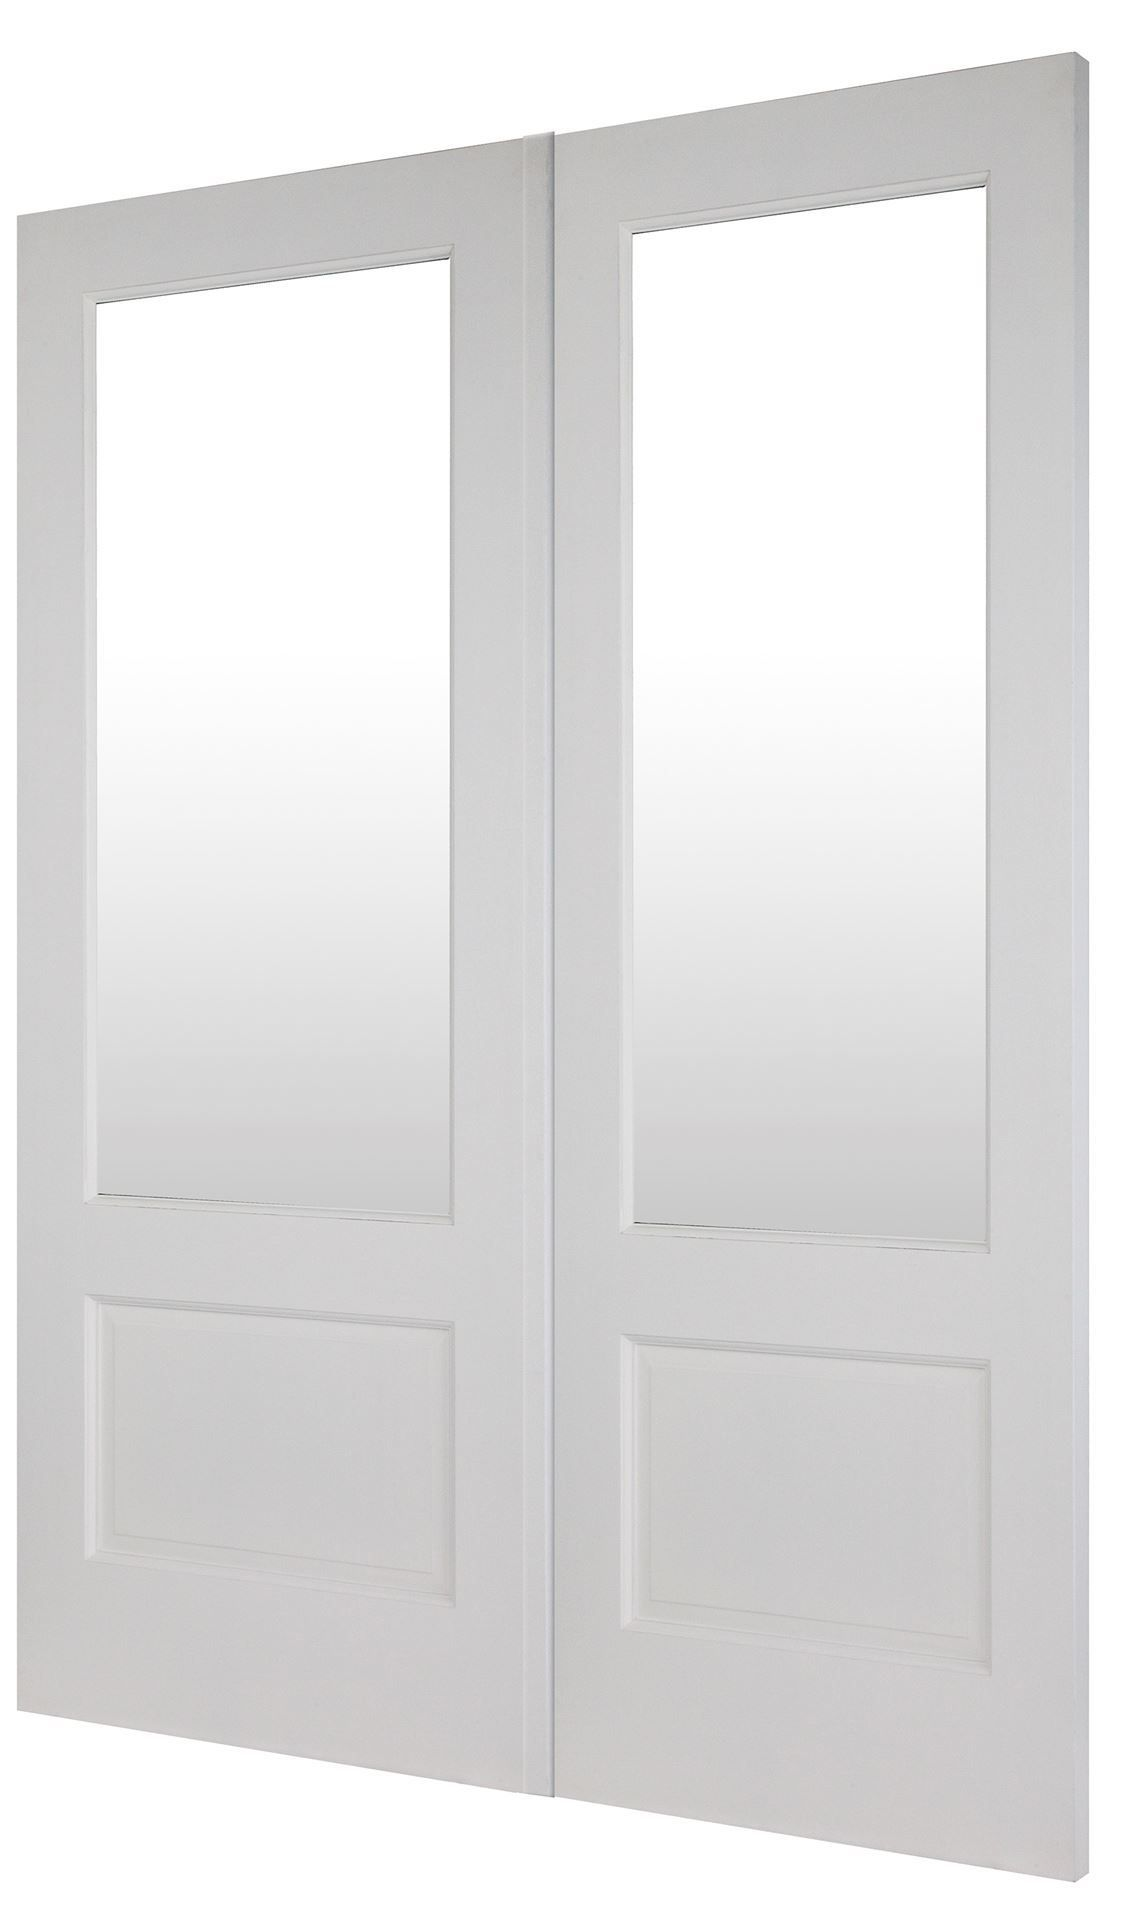 COBHAM PAIR - is a part of Todd Doors wide range of pre-primed hardwood